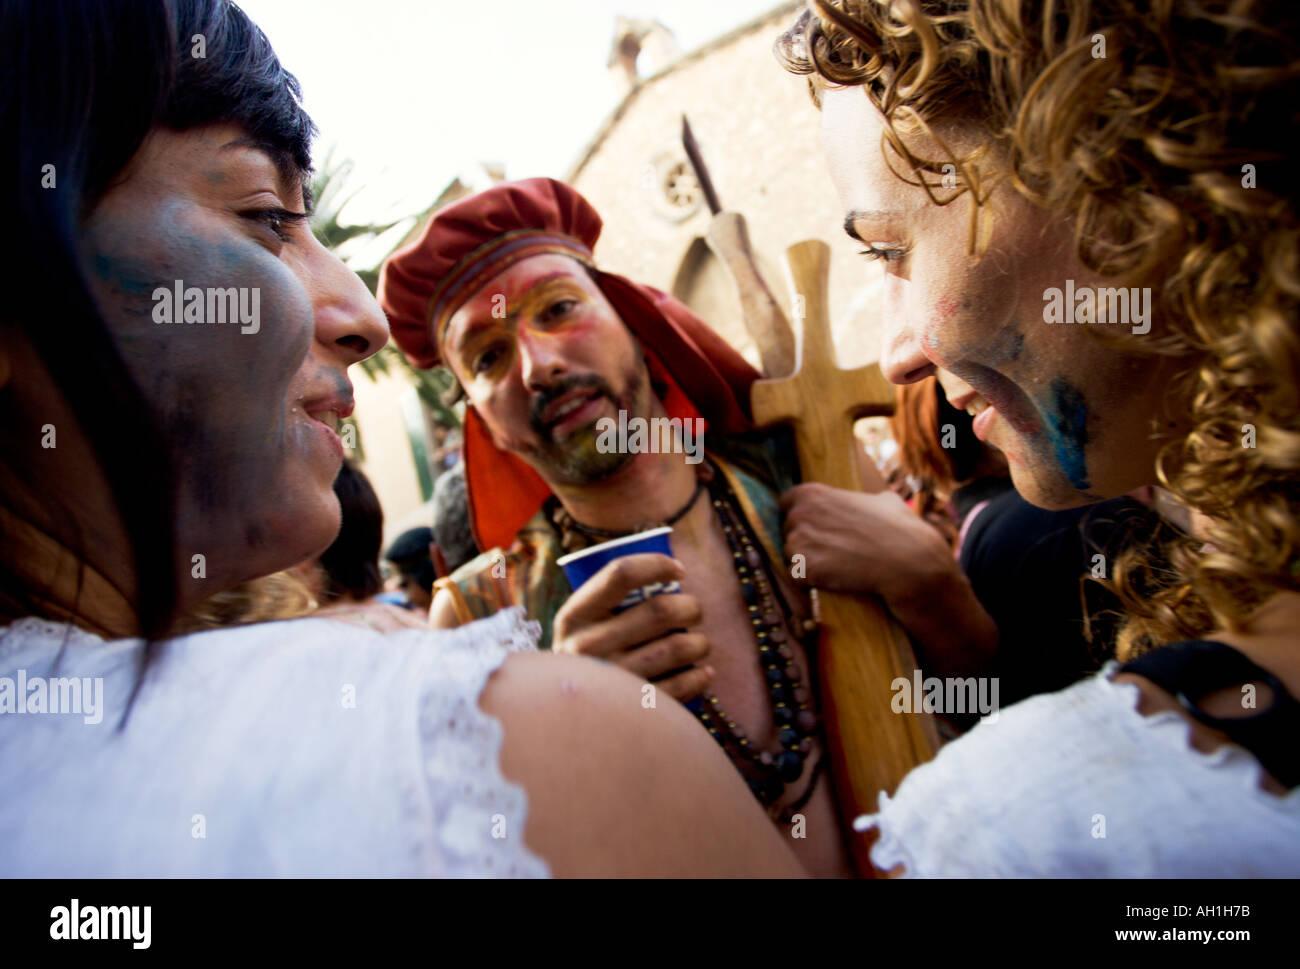 Spanish man serenades two ladies at the Festival of Mare de Deu dels Angels in Pollenca Mallorca Spain - Stock Image